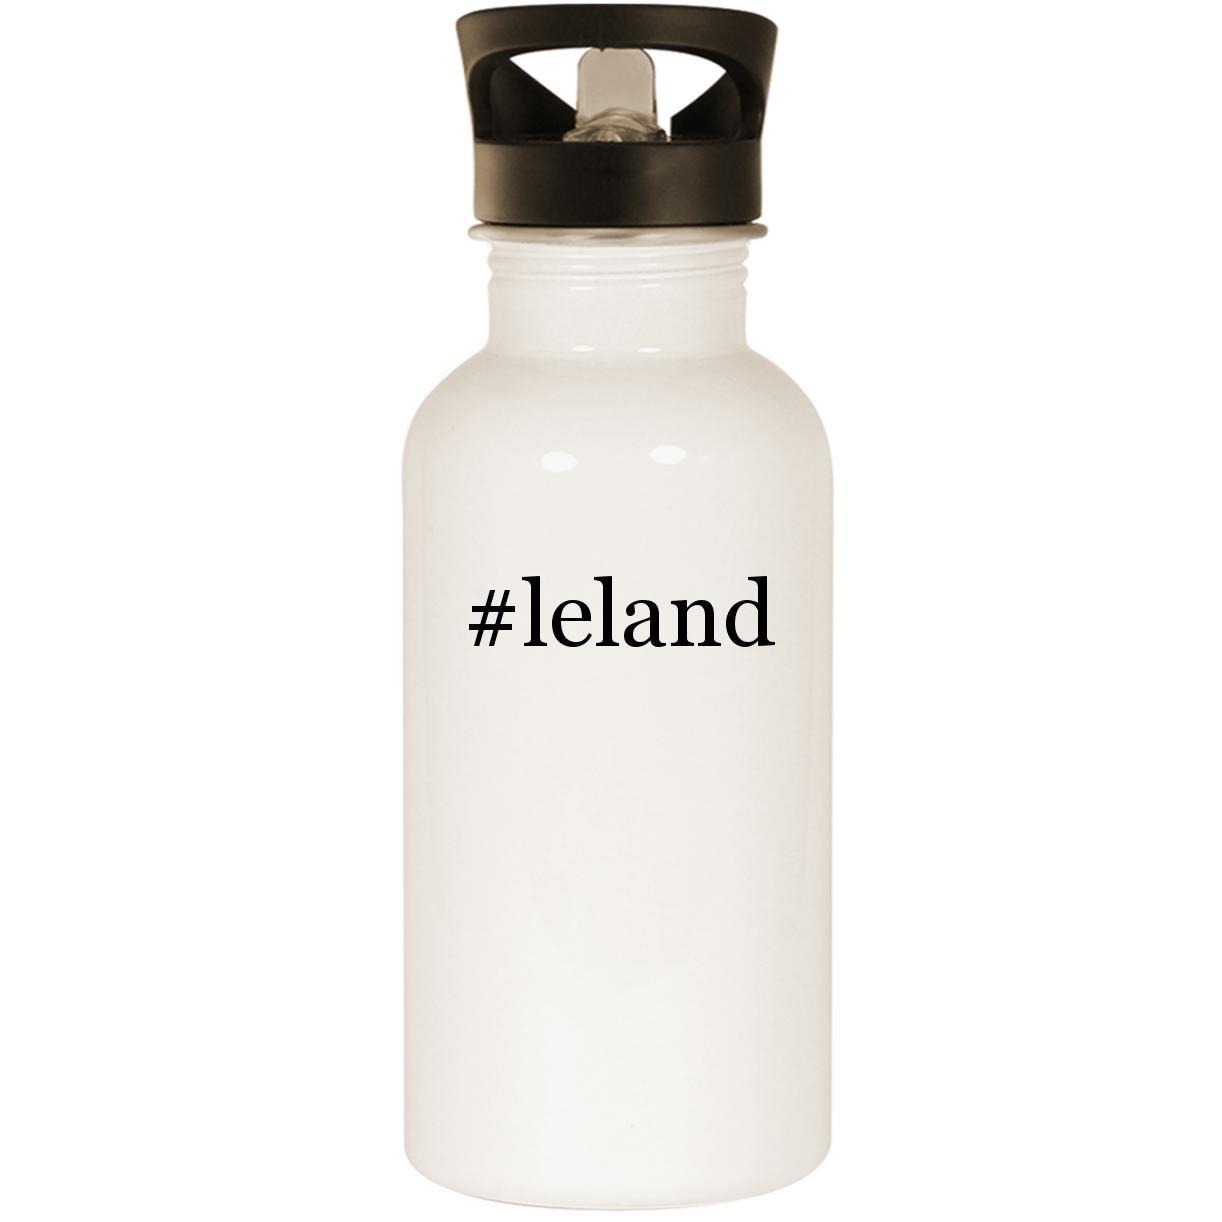 #leland - Stainless Steel Hashtag 20oz Road Ready Water Bottle, White